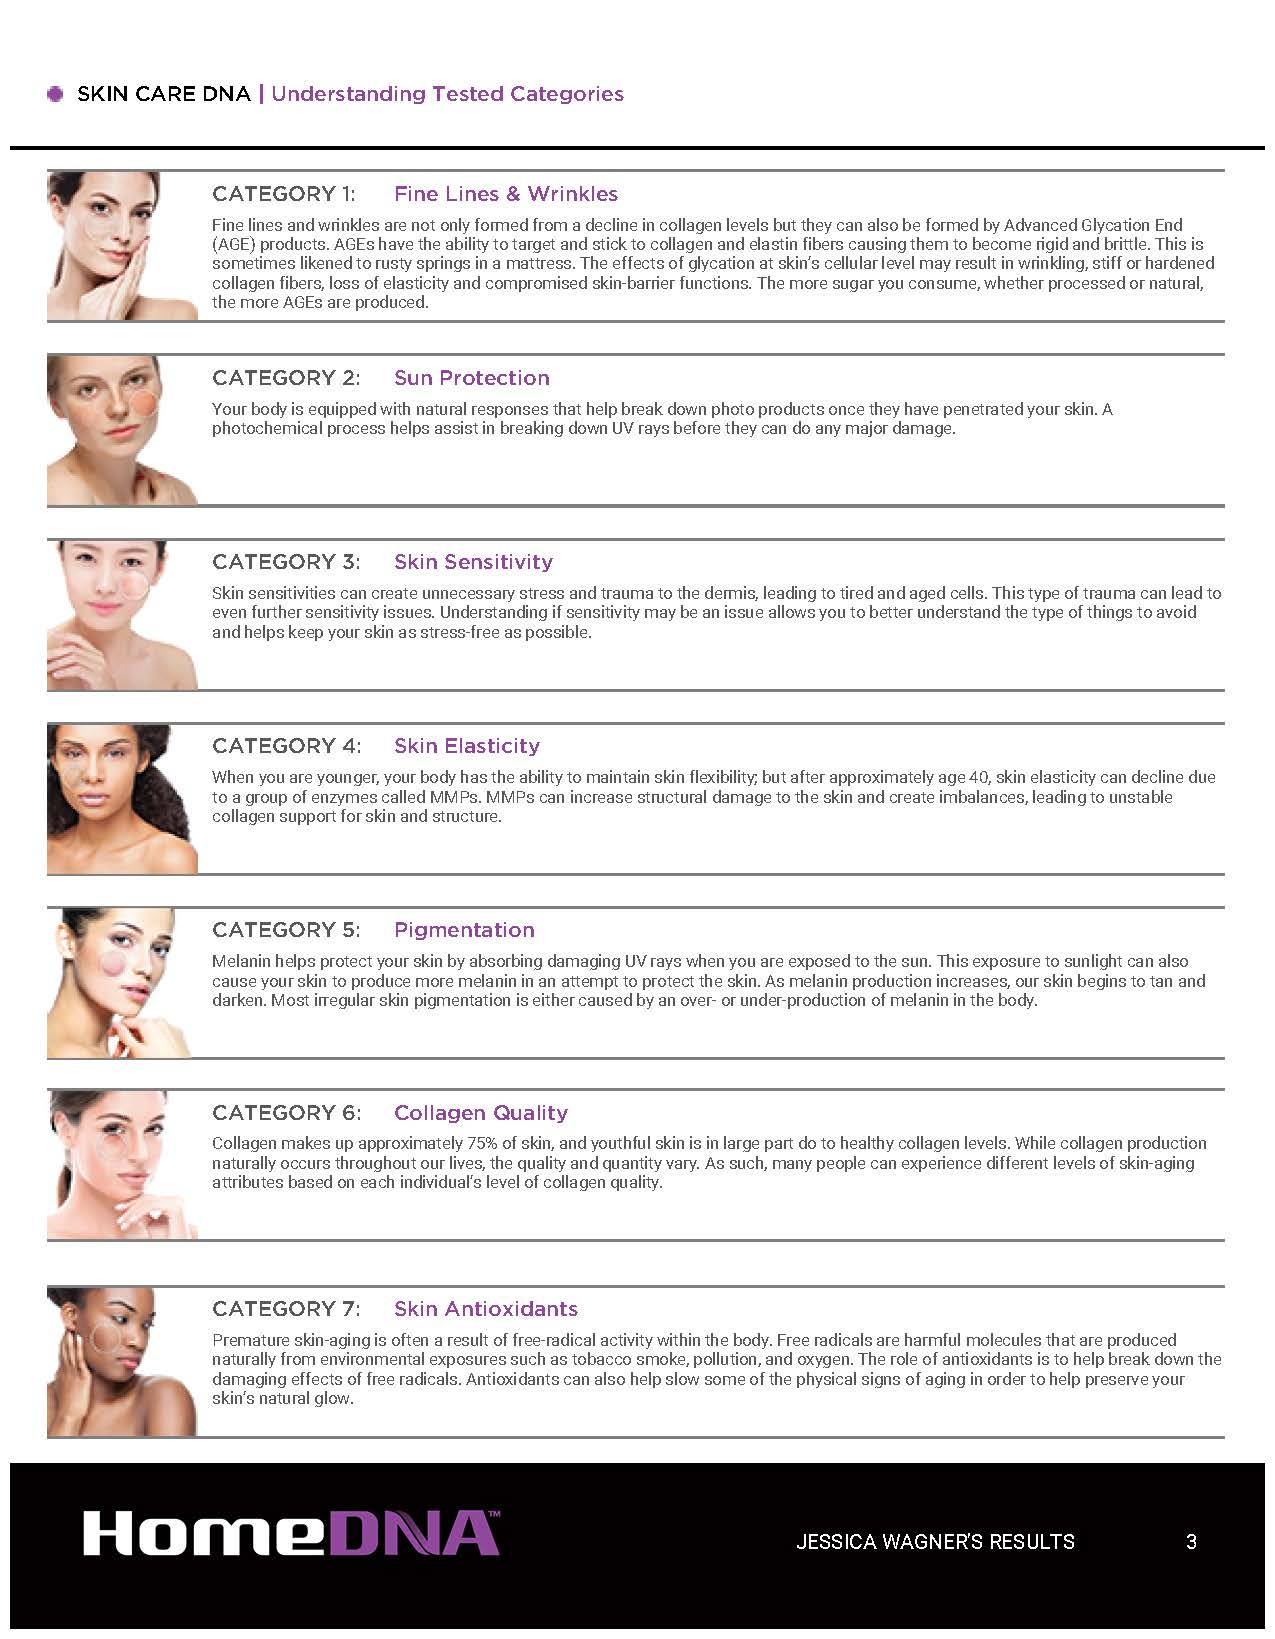 Jess_DNA_Skin_Results_Page_03.jpg